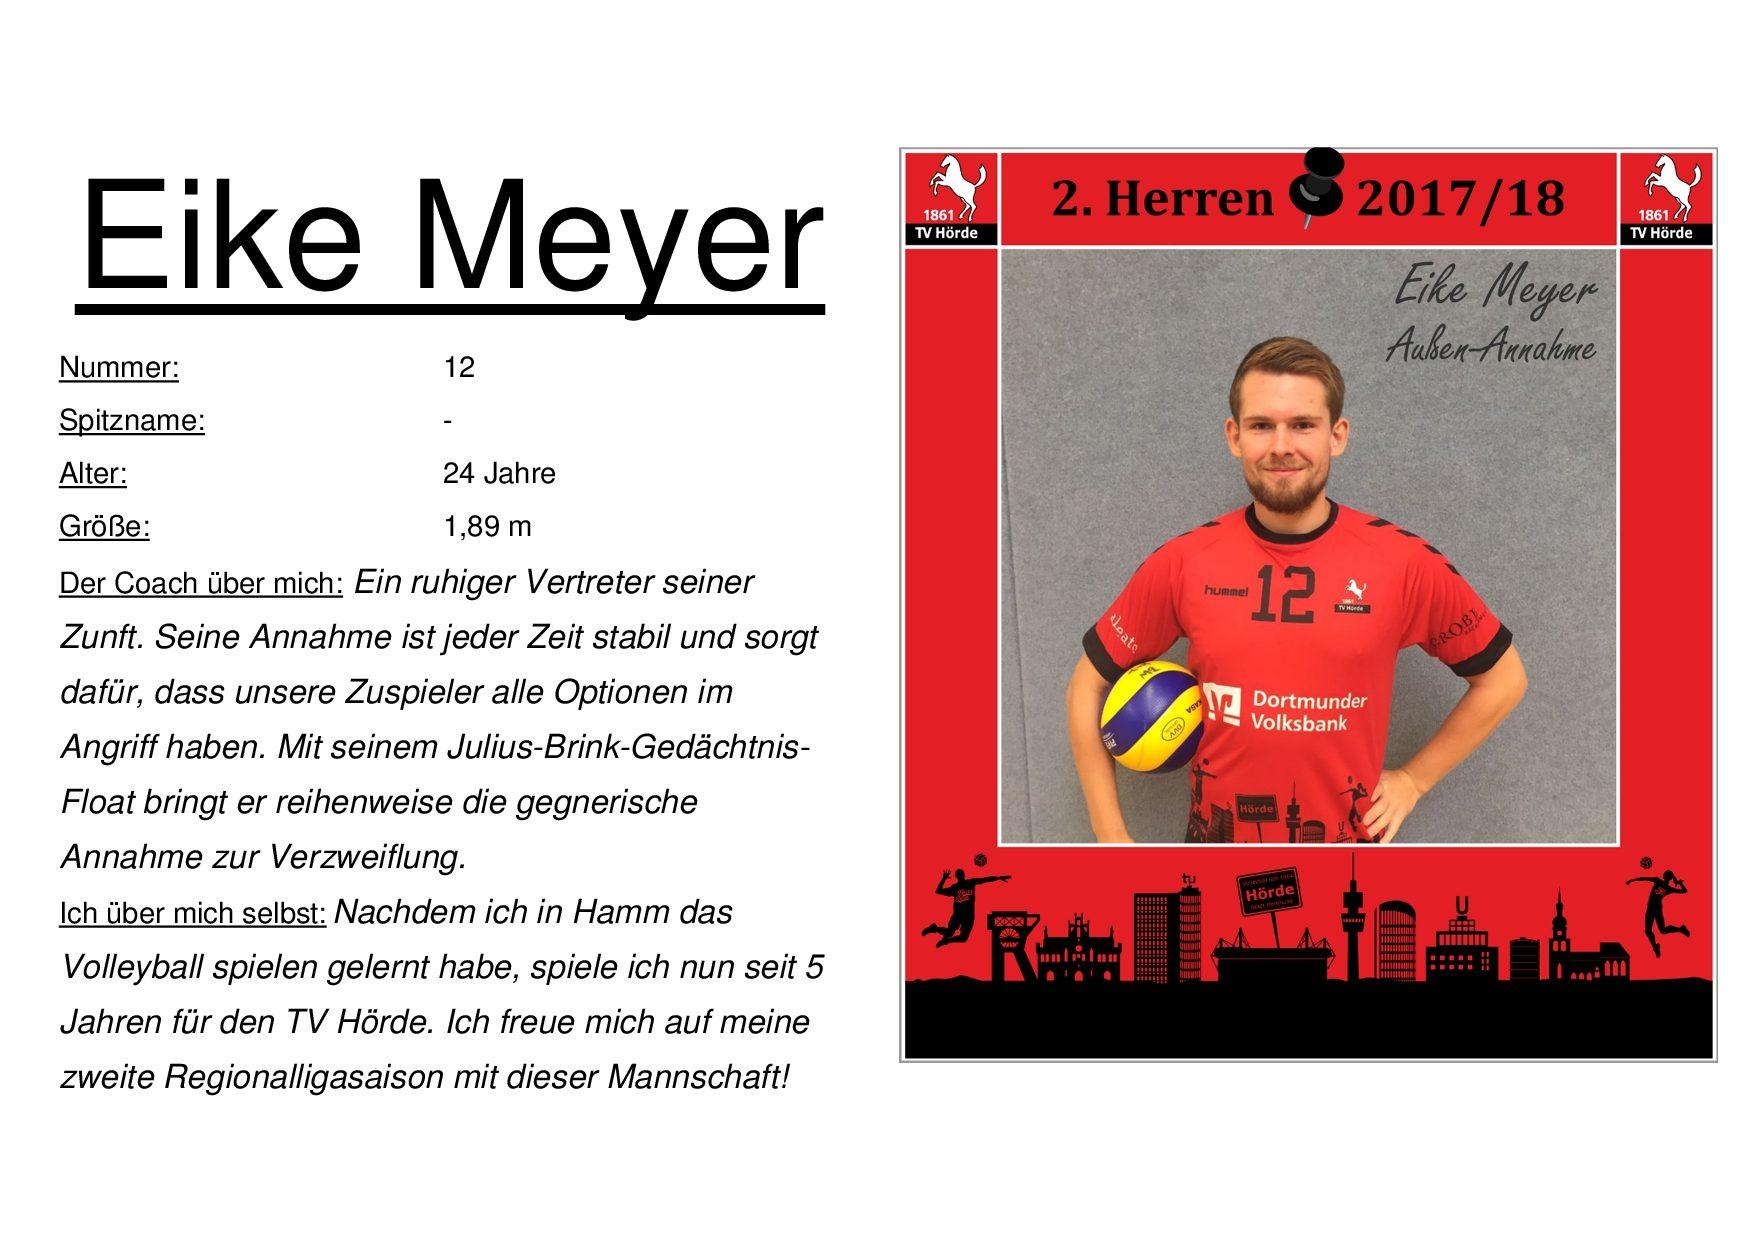 Eike Meyer